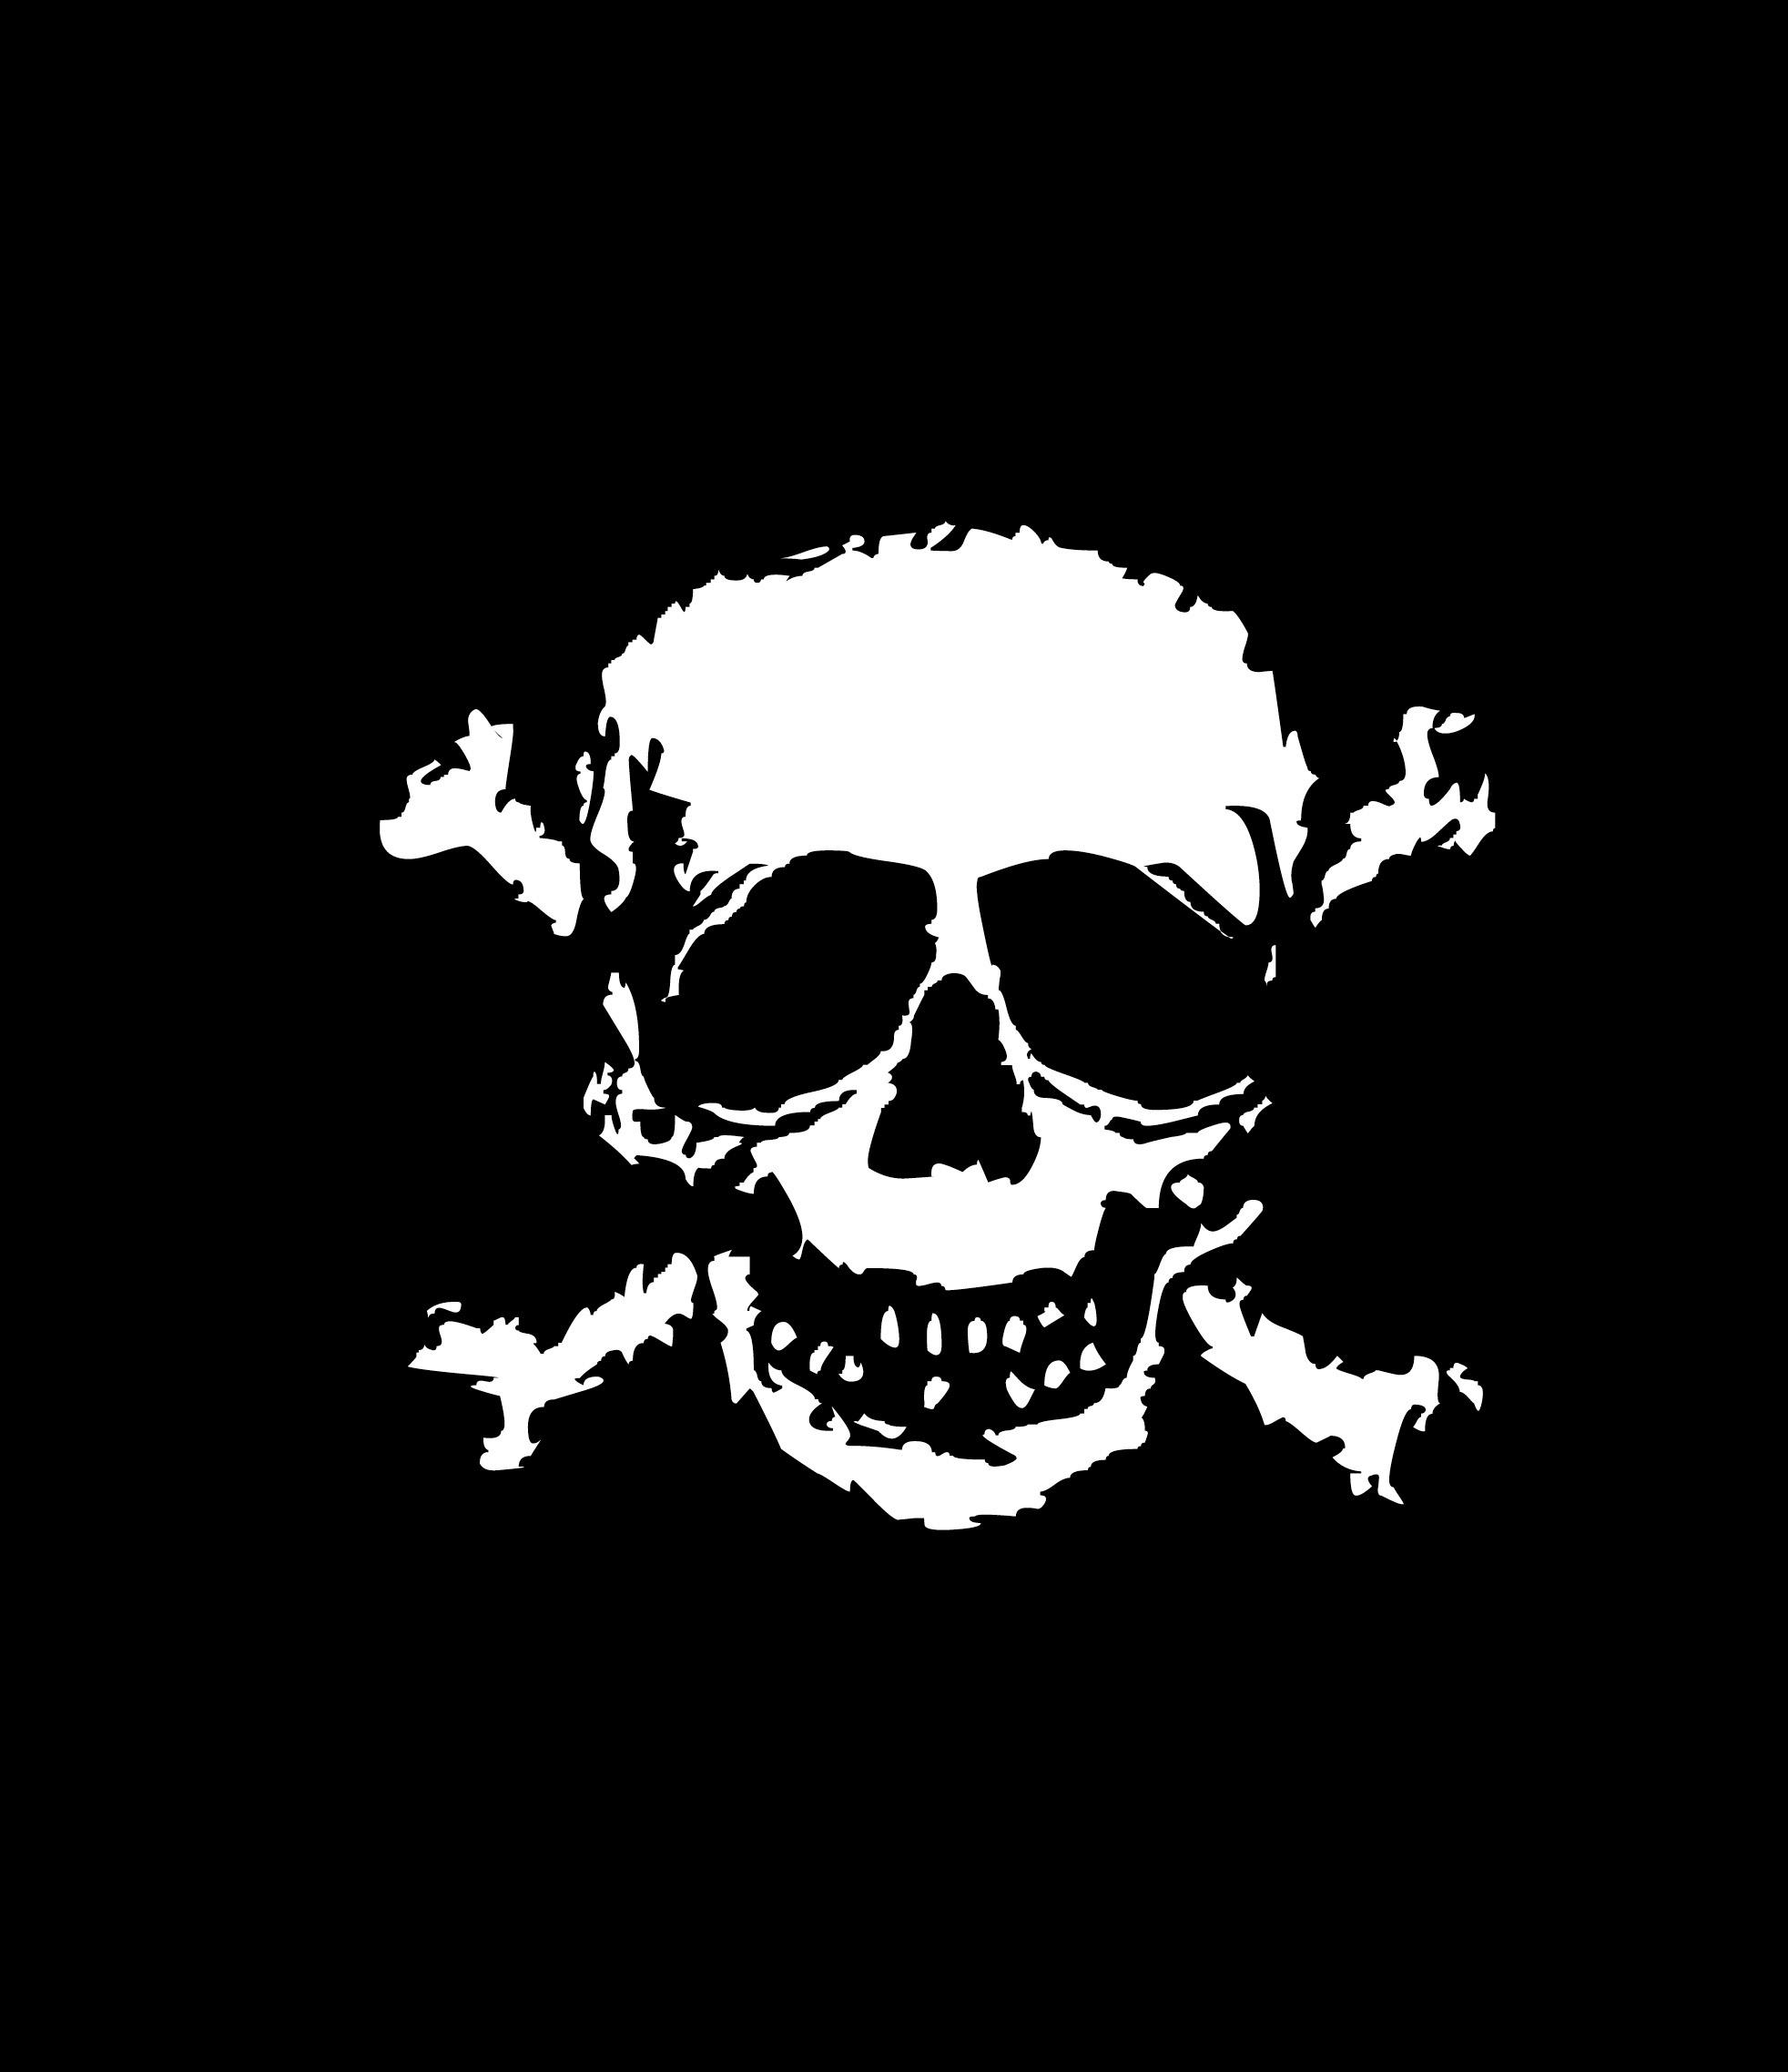 Image of distored skull and crossed bones.